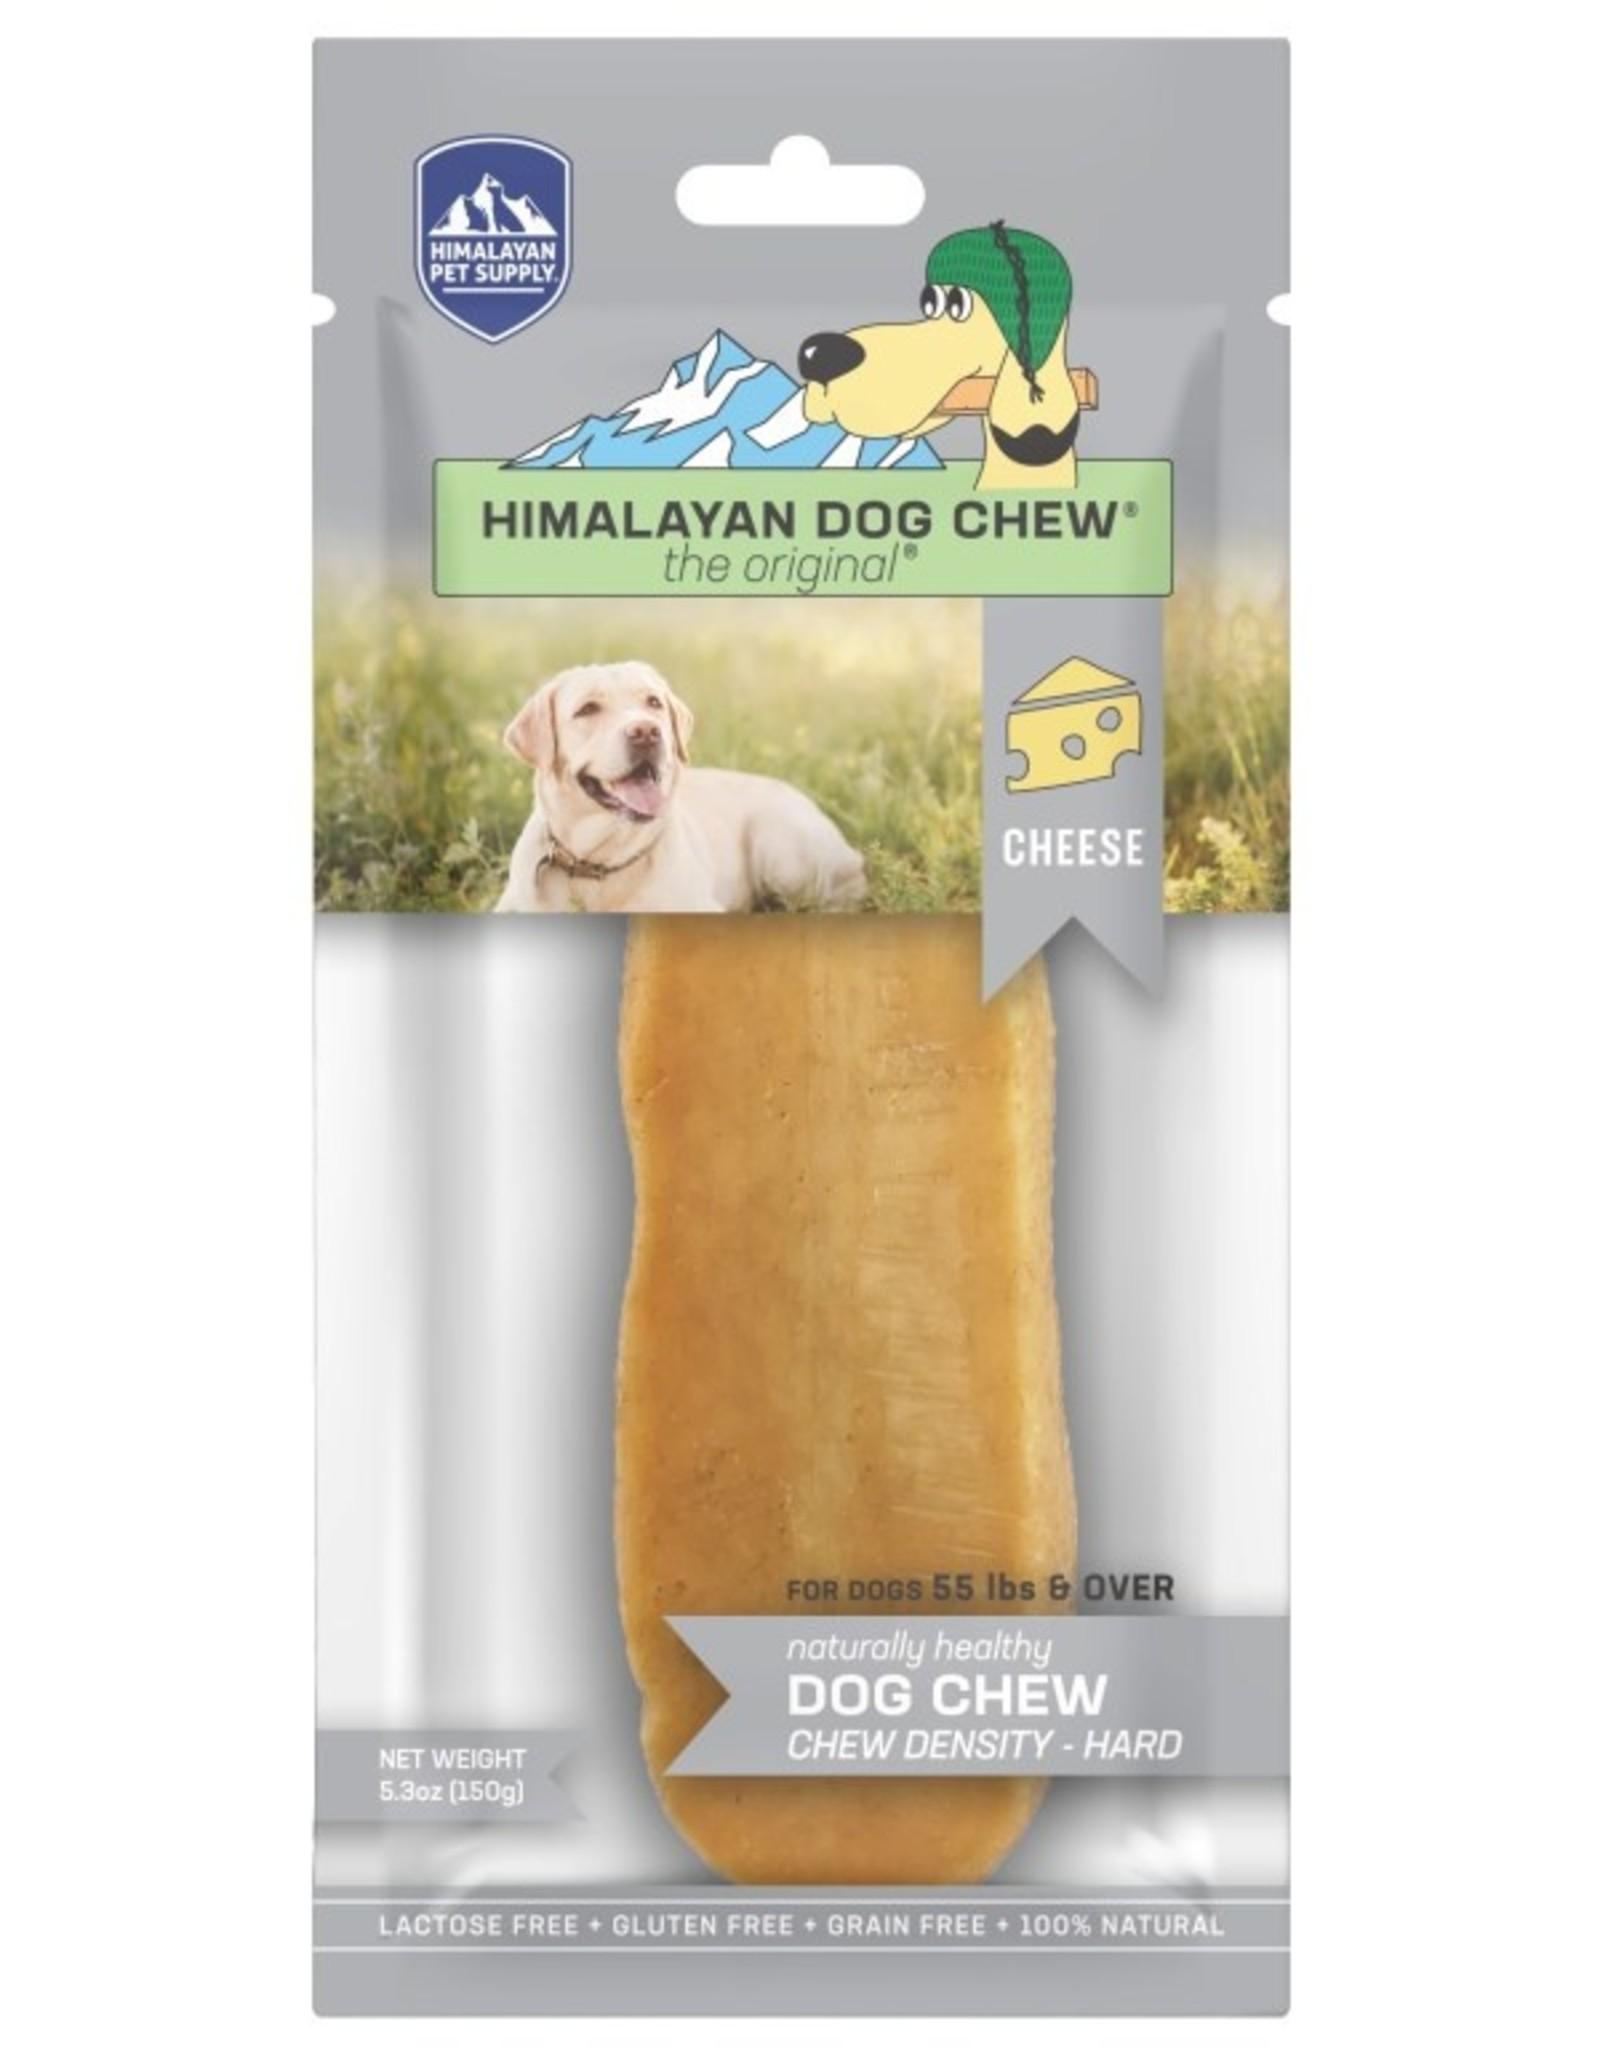 Himalayan Dog Chew Himalayan Chew XL